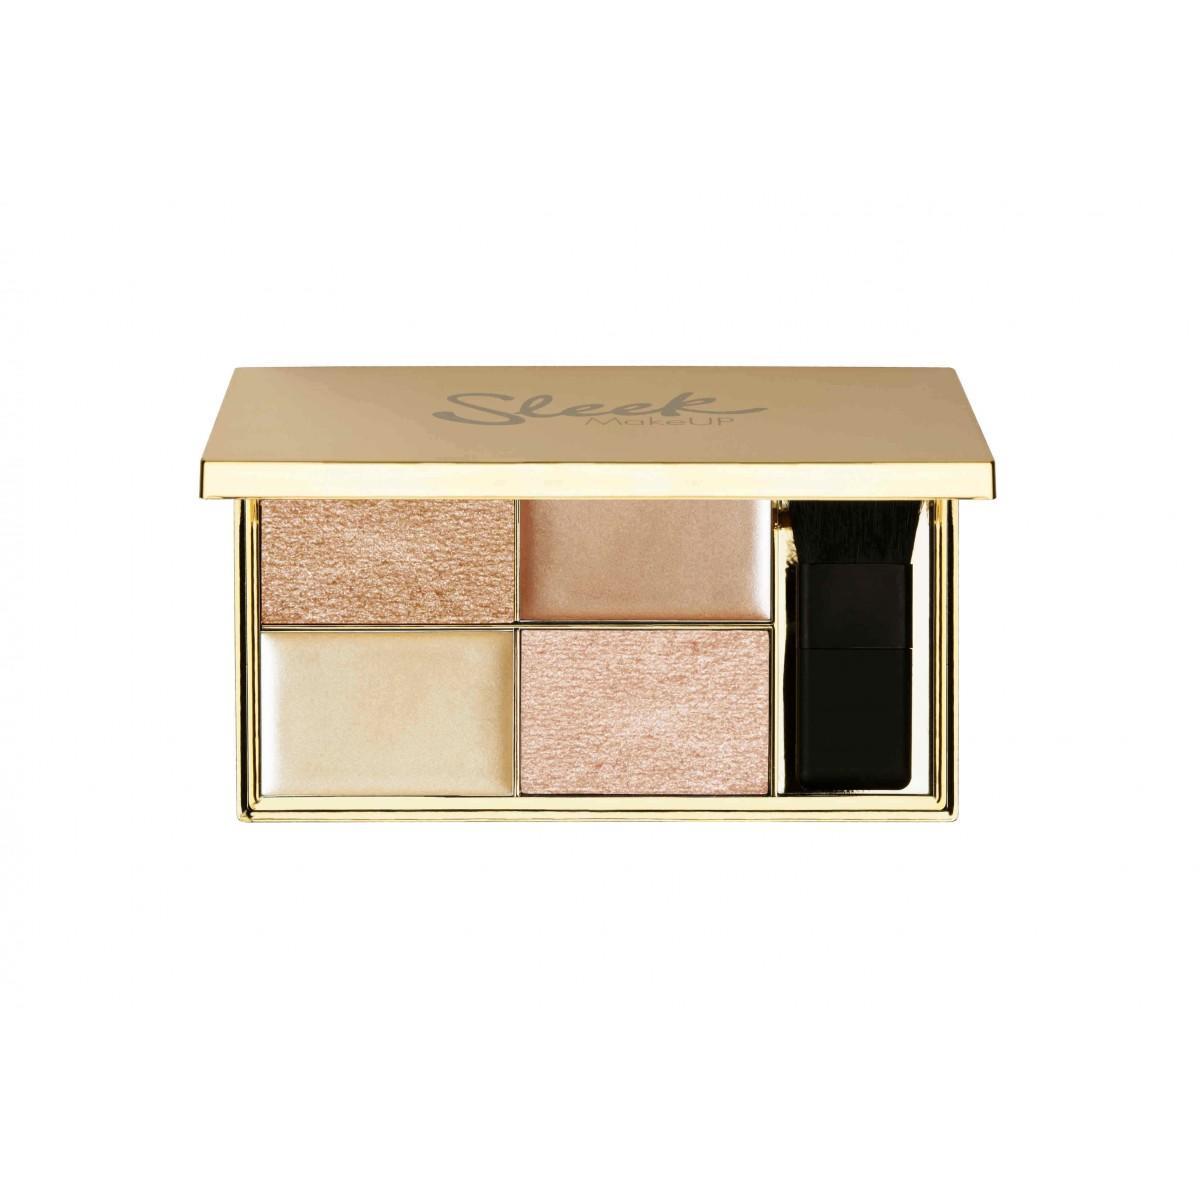 Sleek MakeUP Highlighting Palette Cleopatra's Kiss